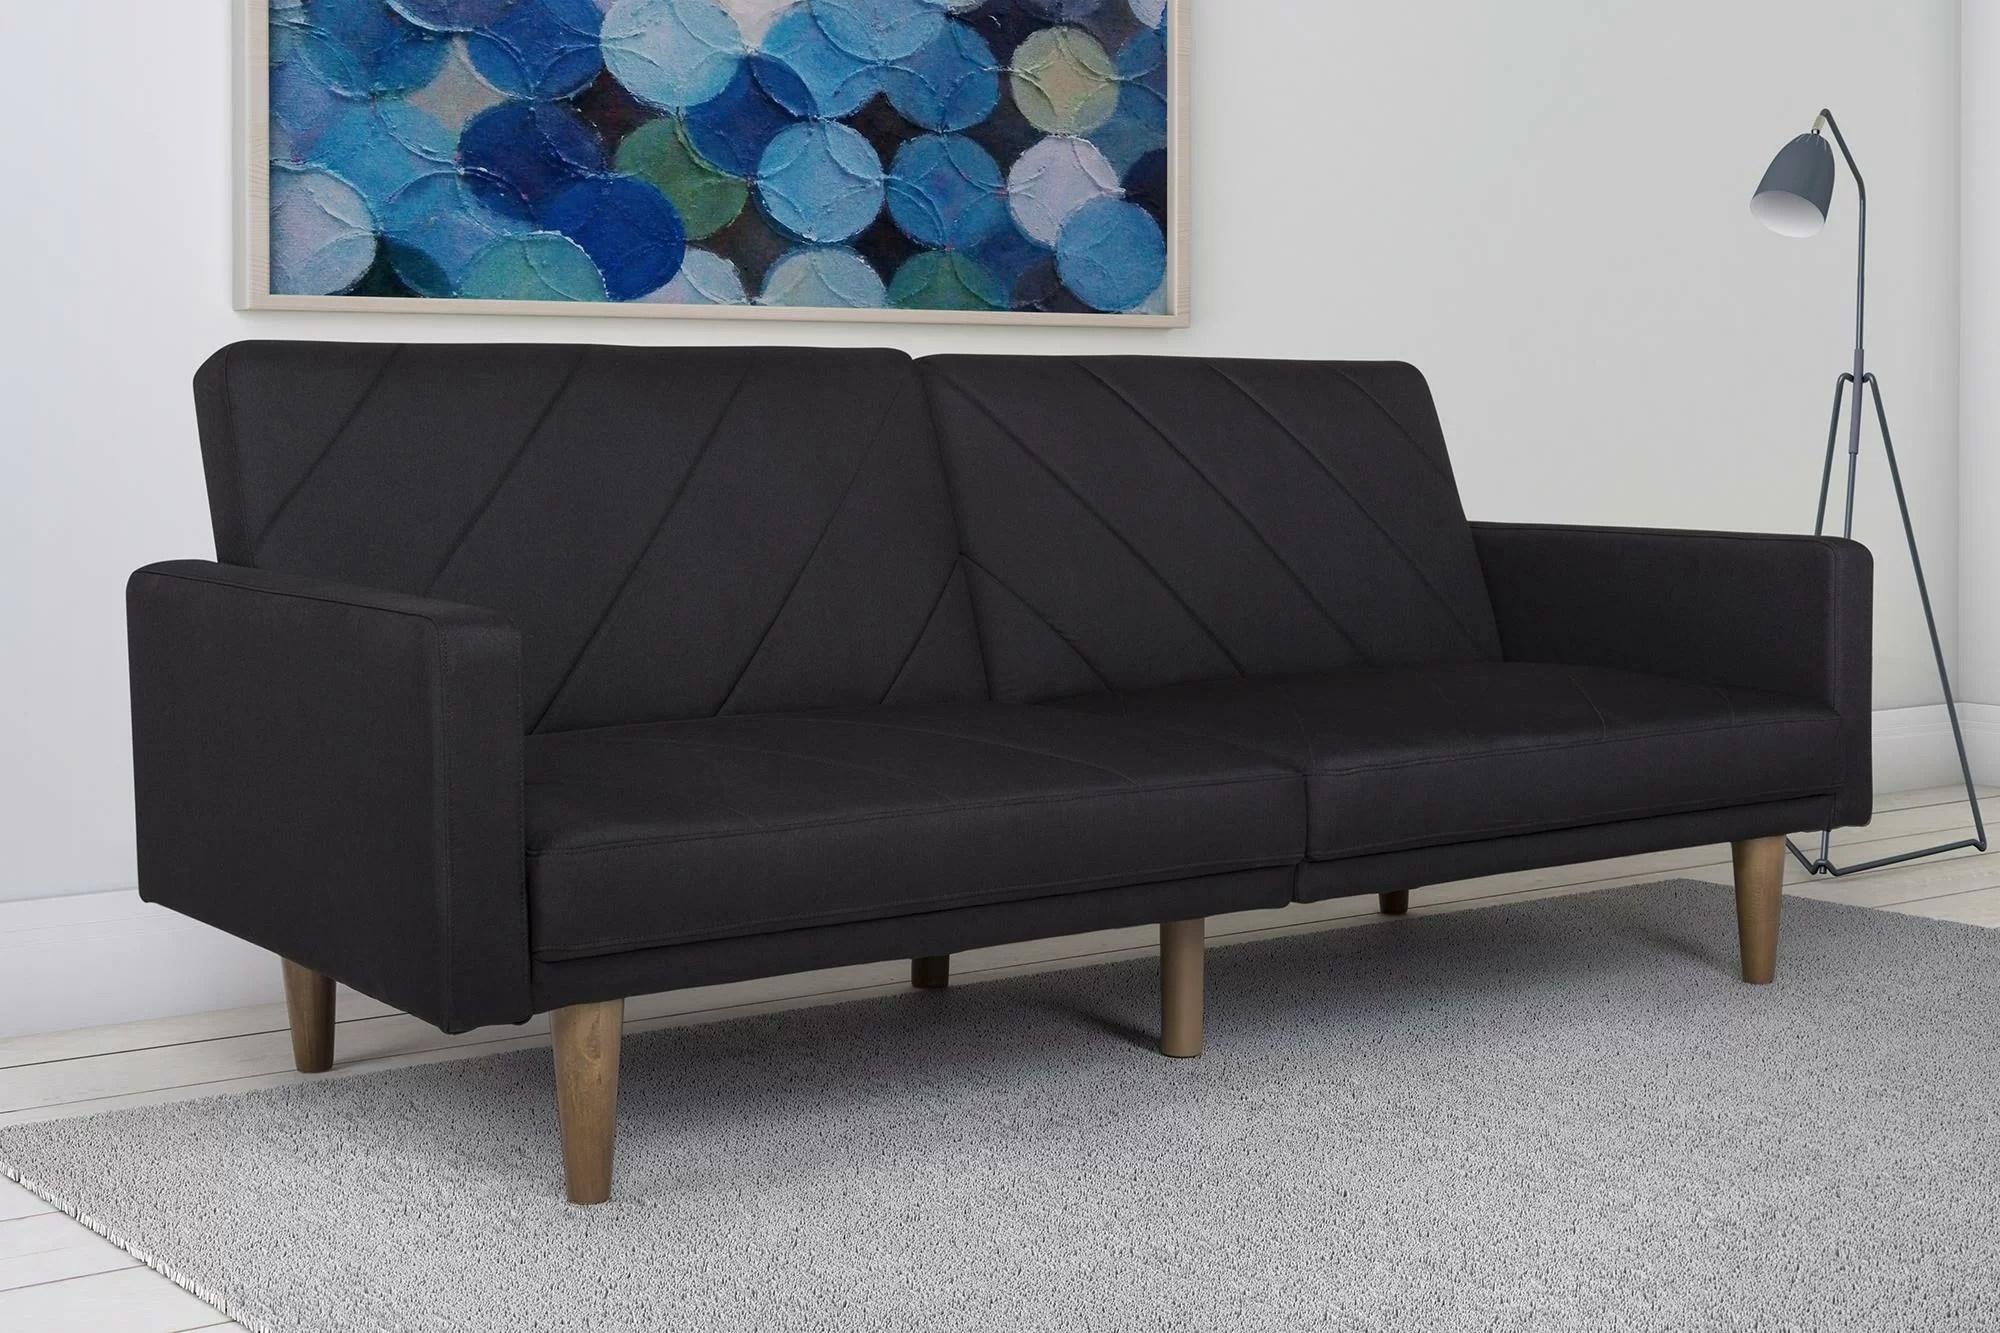 where can i buy cheap sofa latest leather designs 2017 a futon